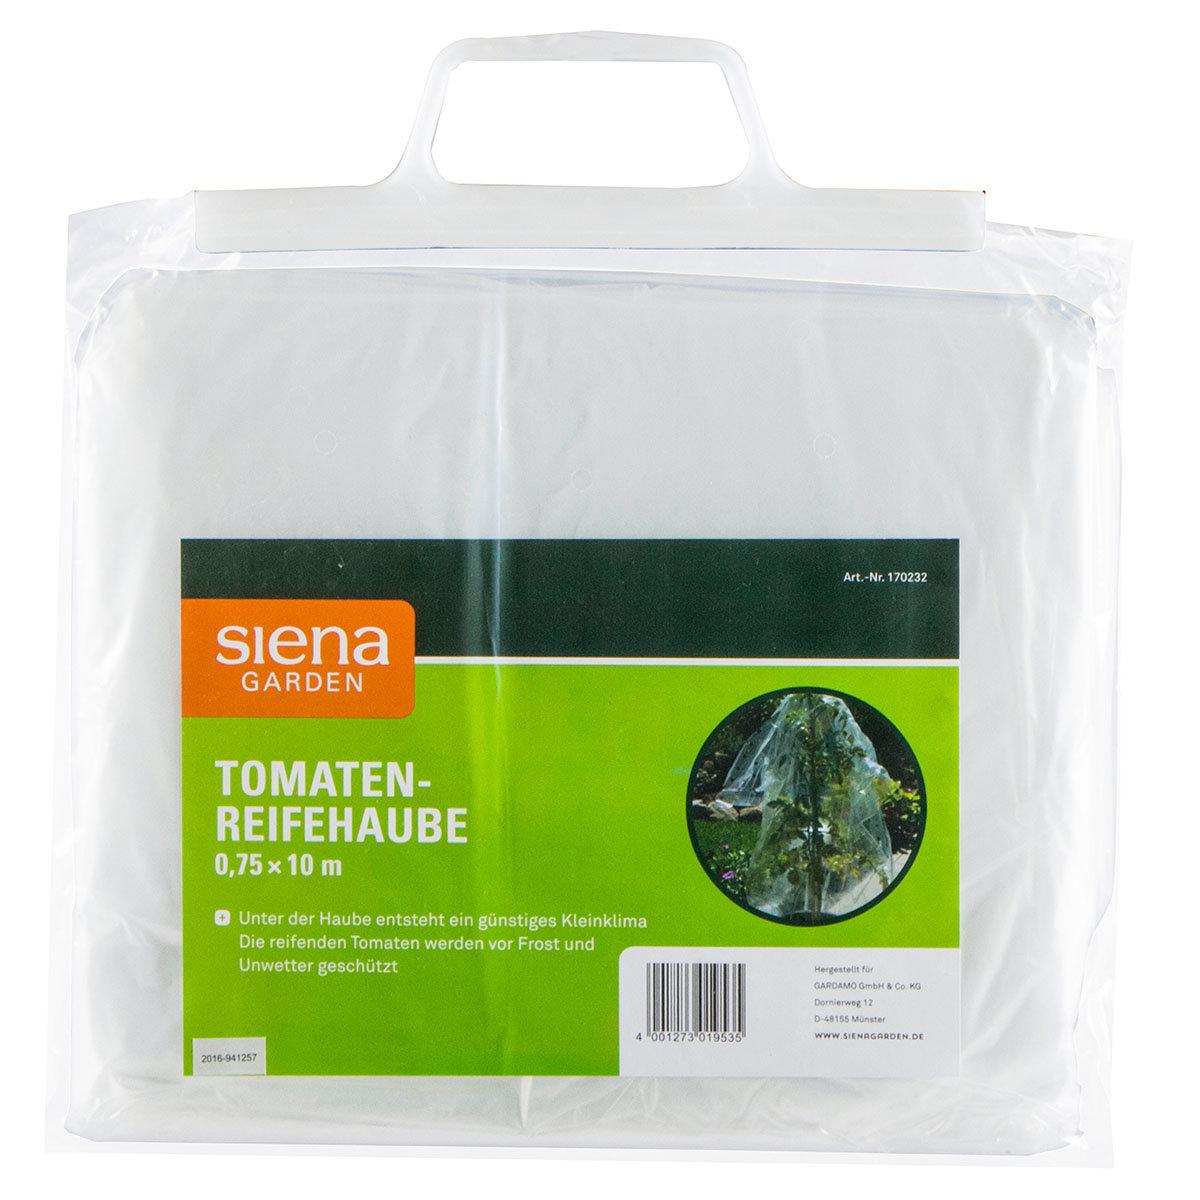 Tomatenreifehaube